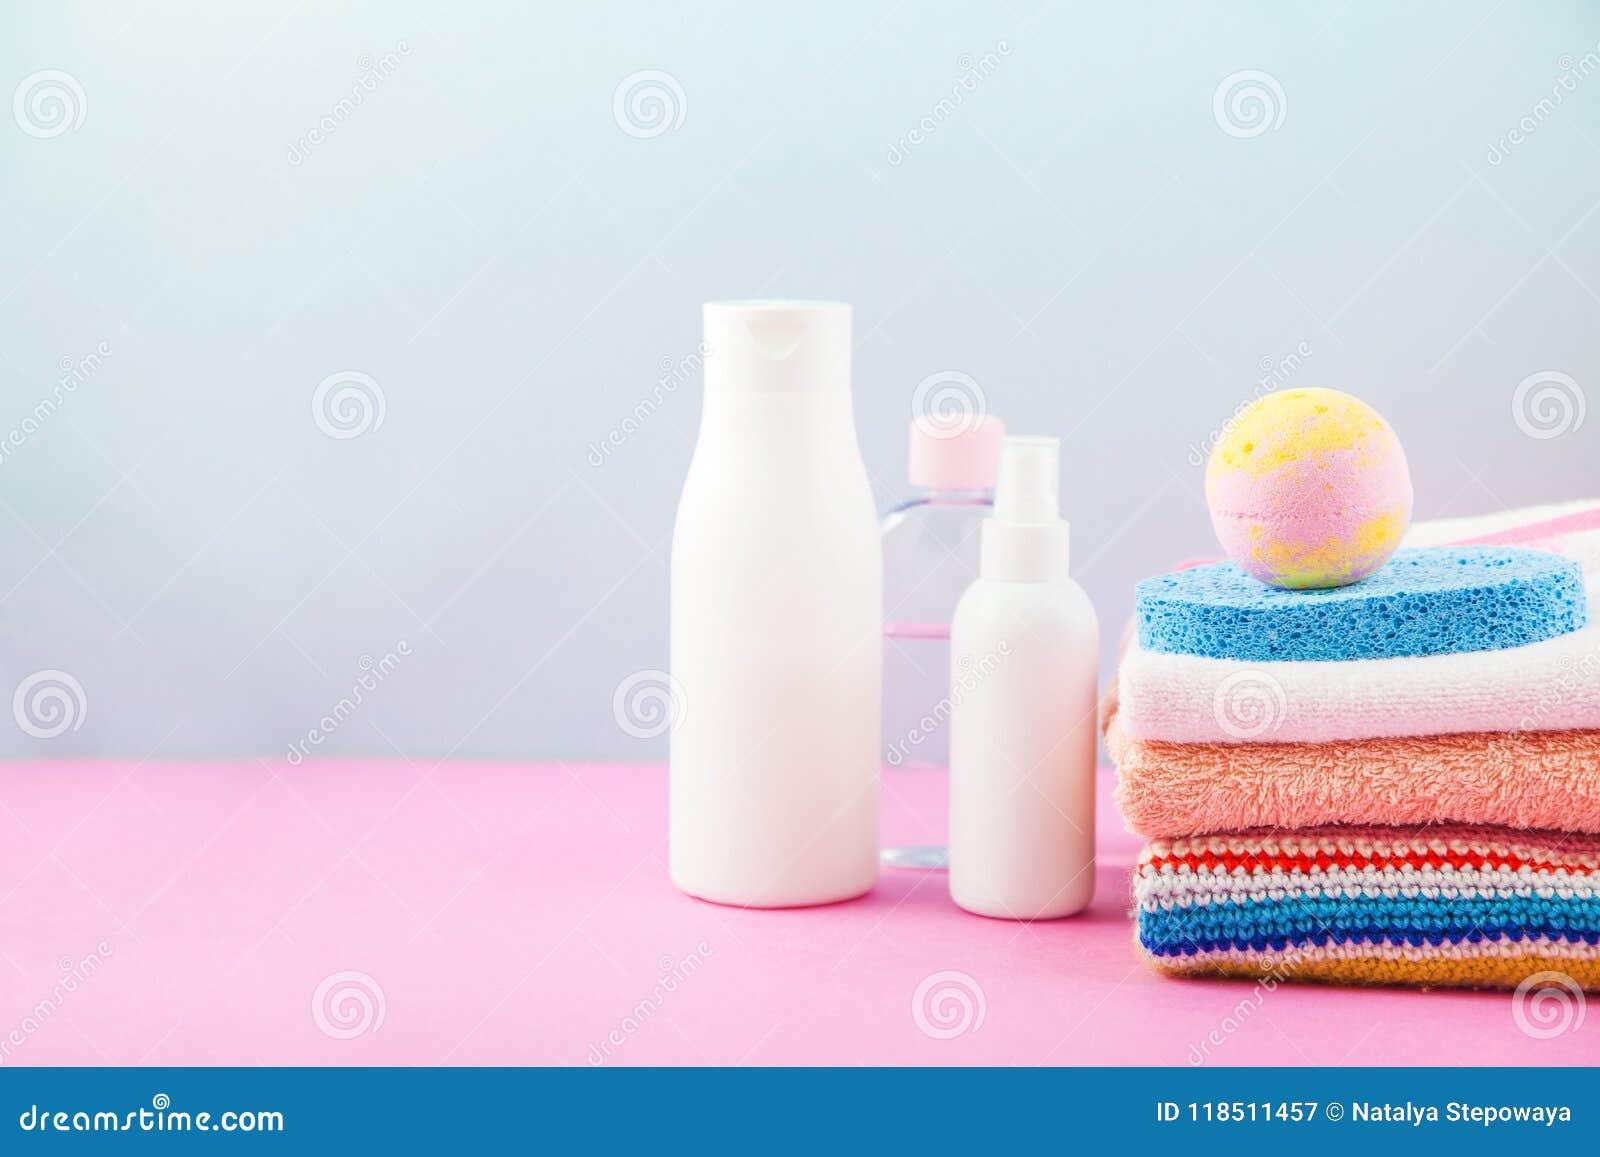 Bathroom Accessories - Towels, Cream, Bath Foam And Shampoos On A ...